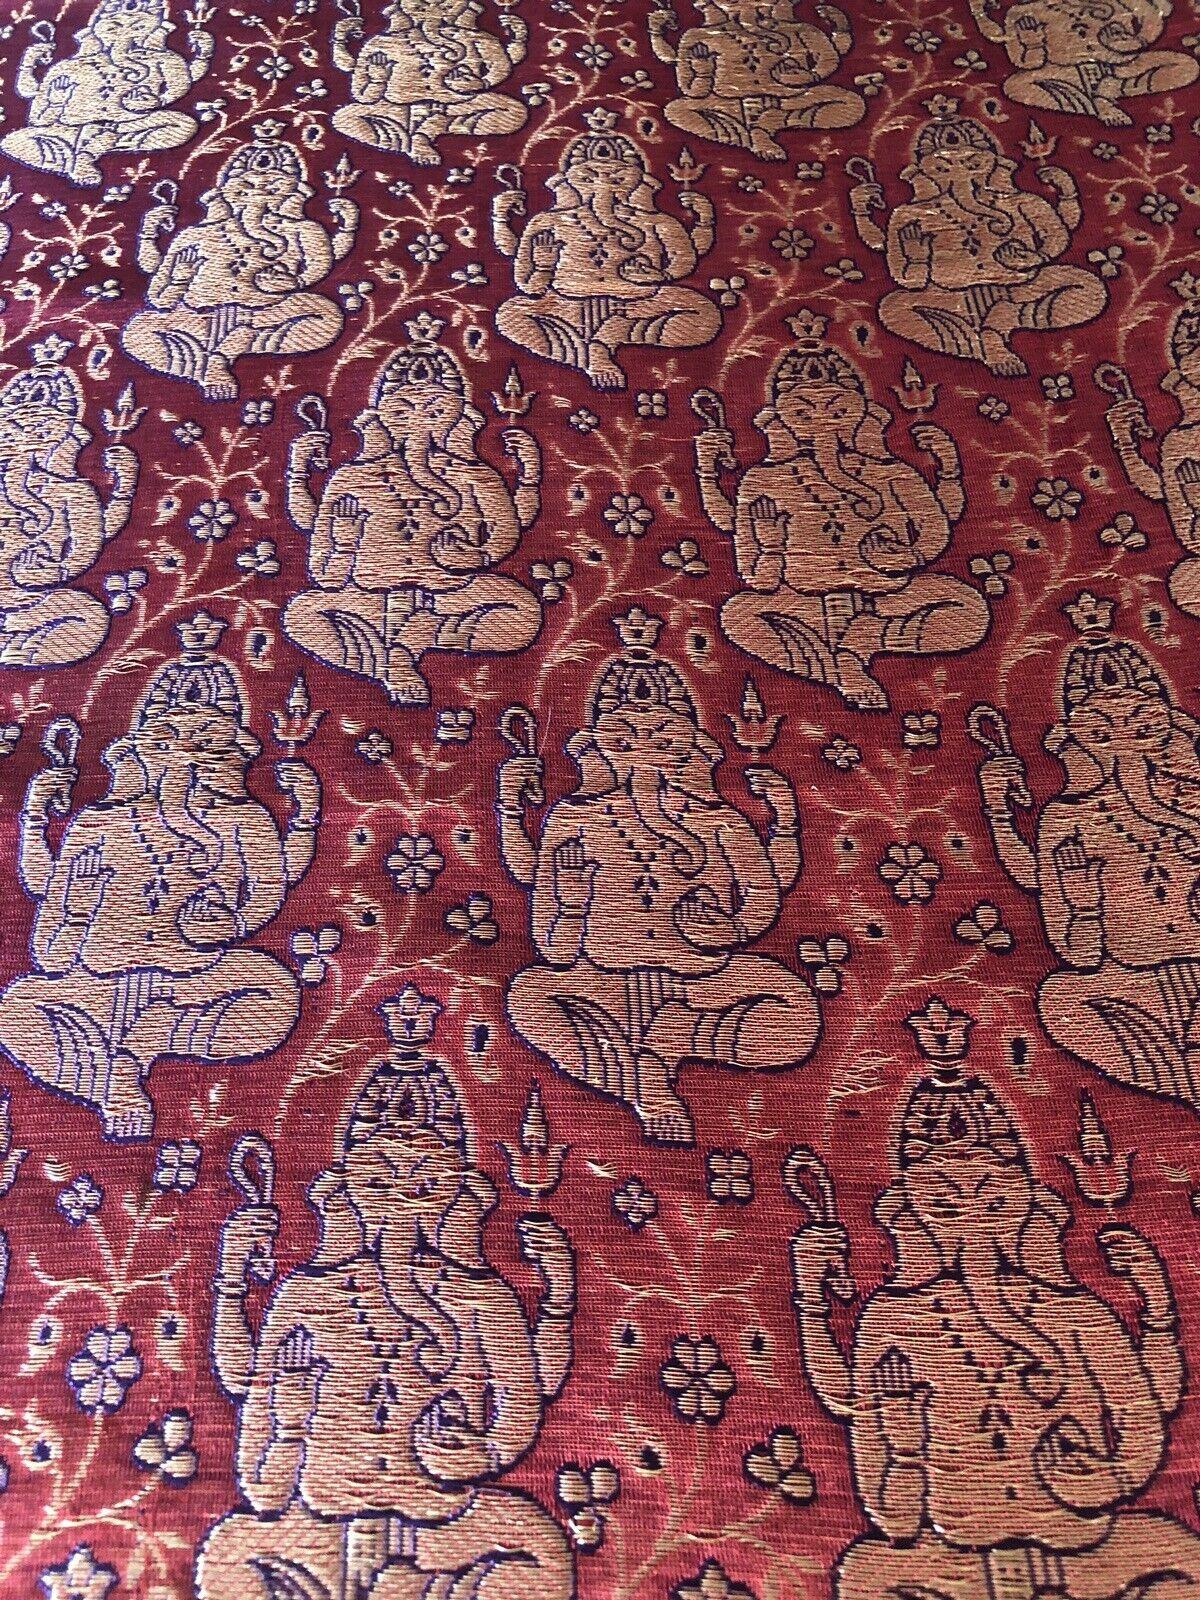 Silk Brocade GANESHA Tapestry Table Runner Unique Rare fait A acheté l'Inde